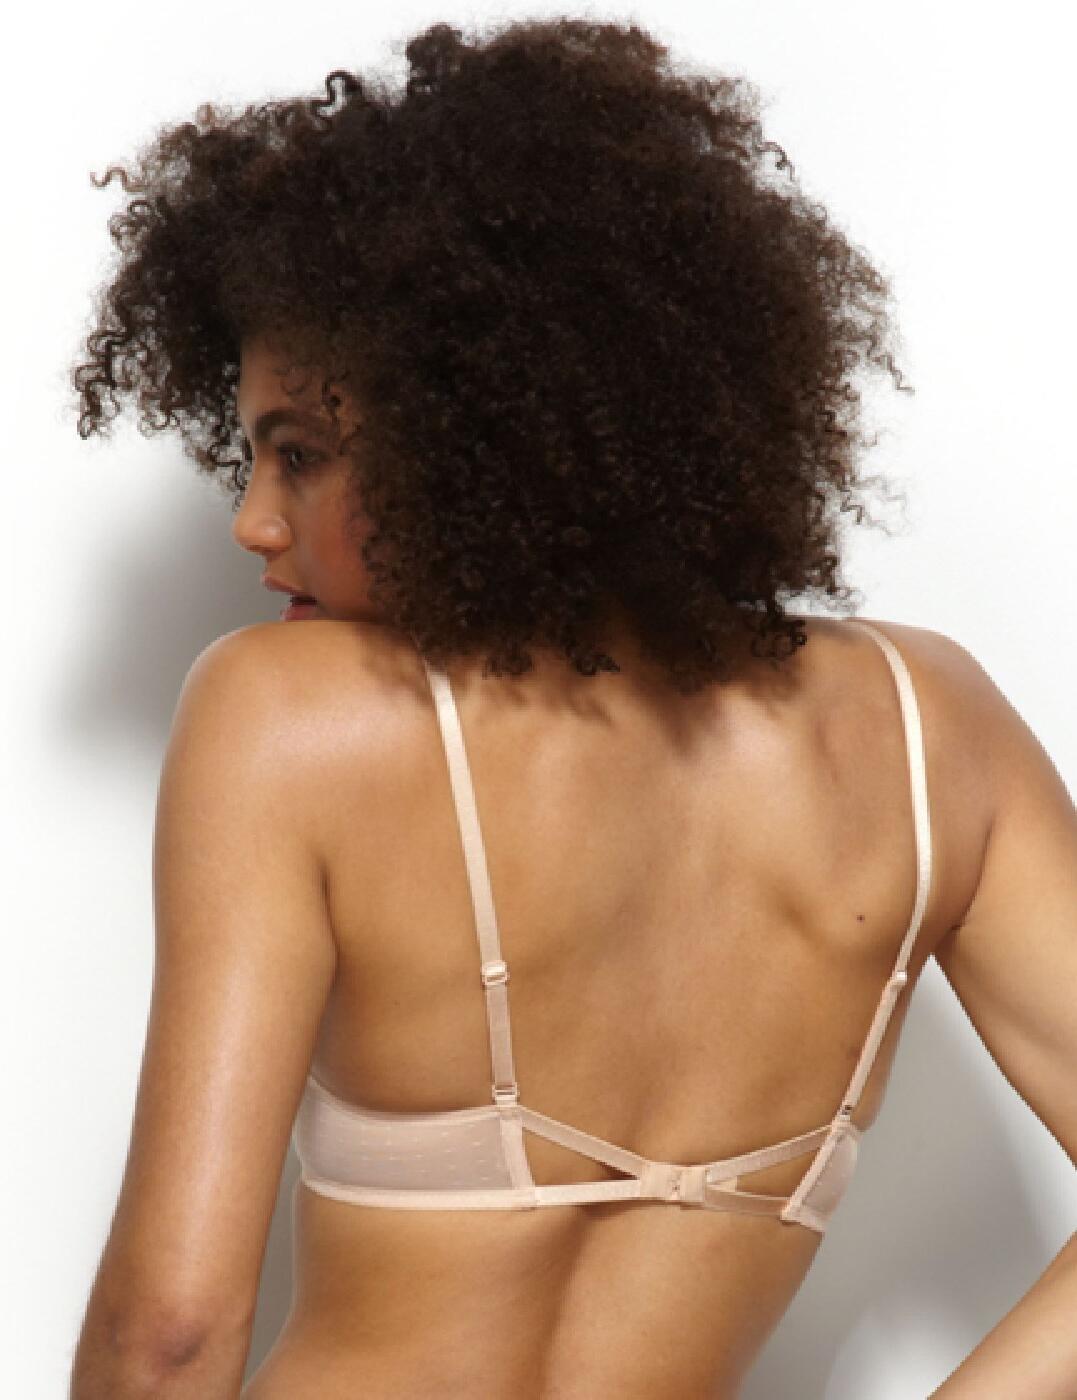 Details about  /Gossard Everyday Dotty Plunge Bra G111 Womens Underwired Padded Bras Lingerie